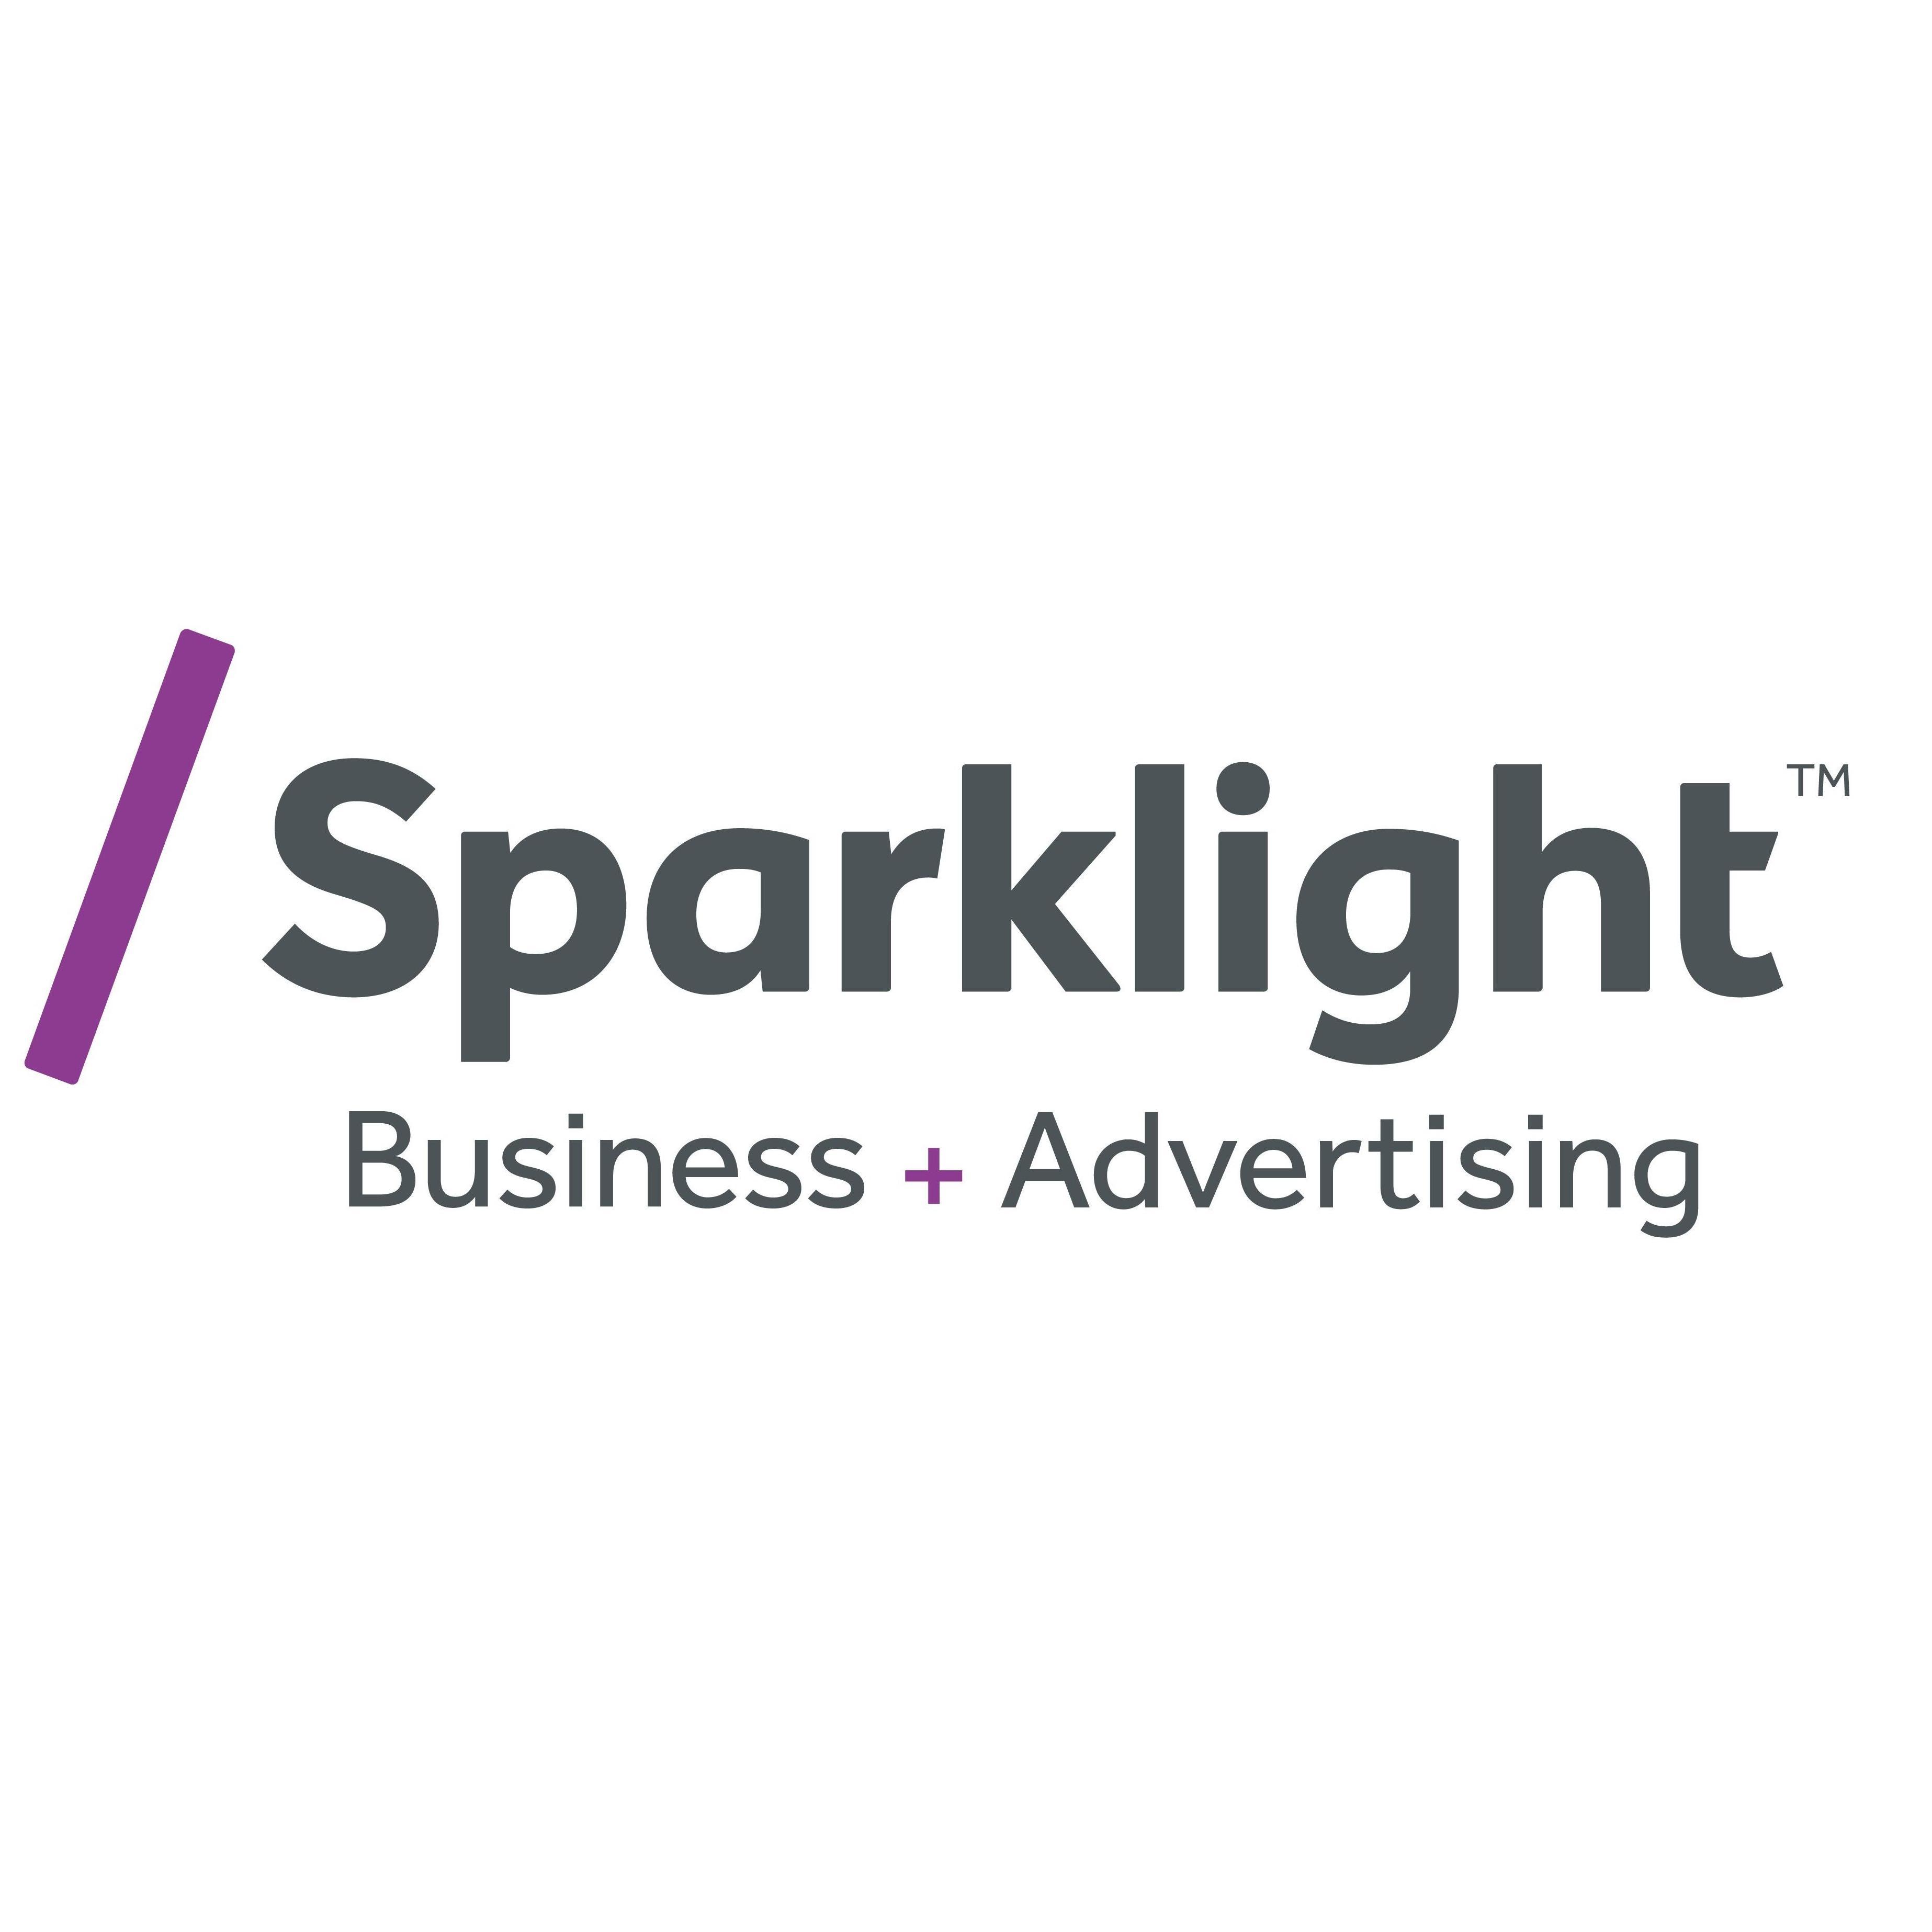 Sparklight Business + Advertising